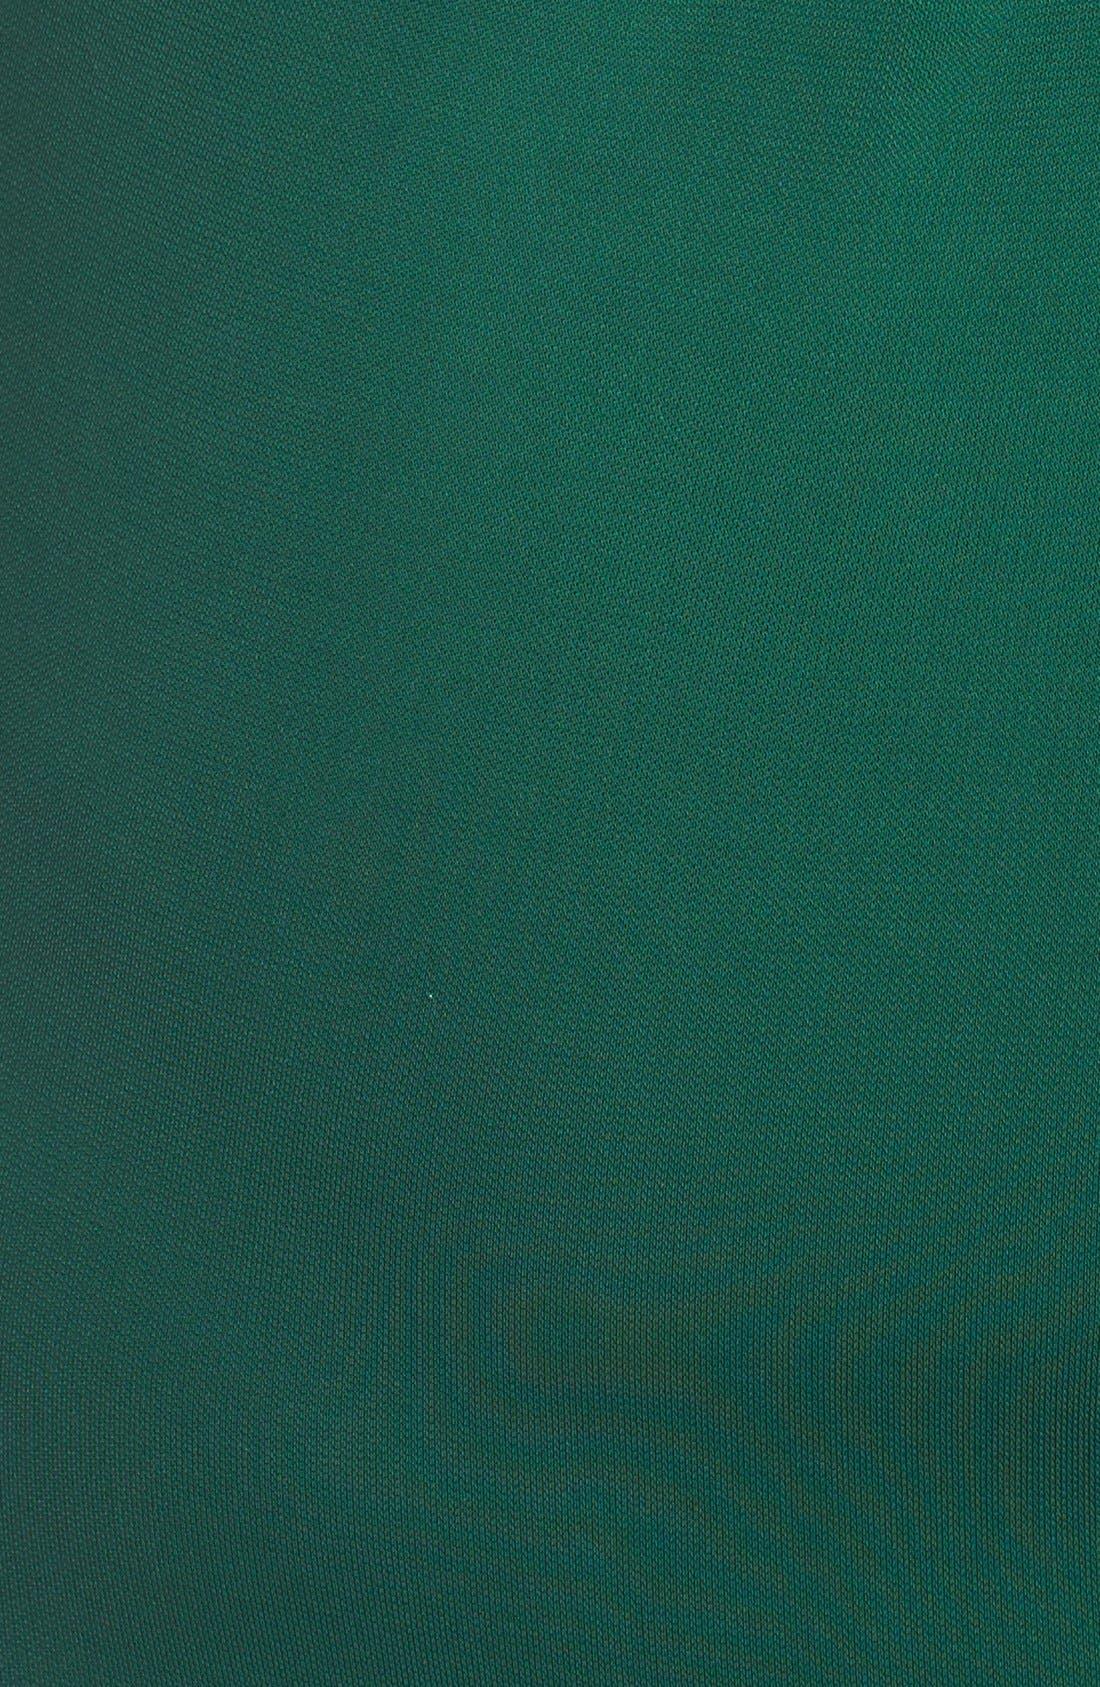 Alternate Image 3  - Badgley Mischka Beaded Jersey Mermaid Gown